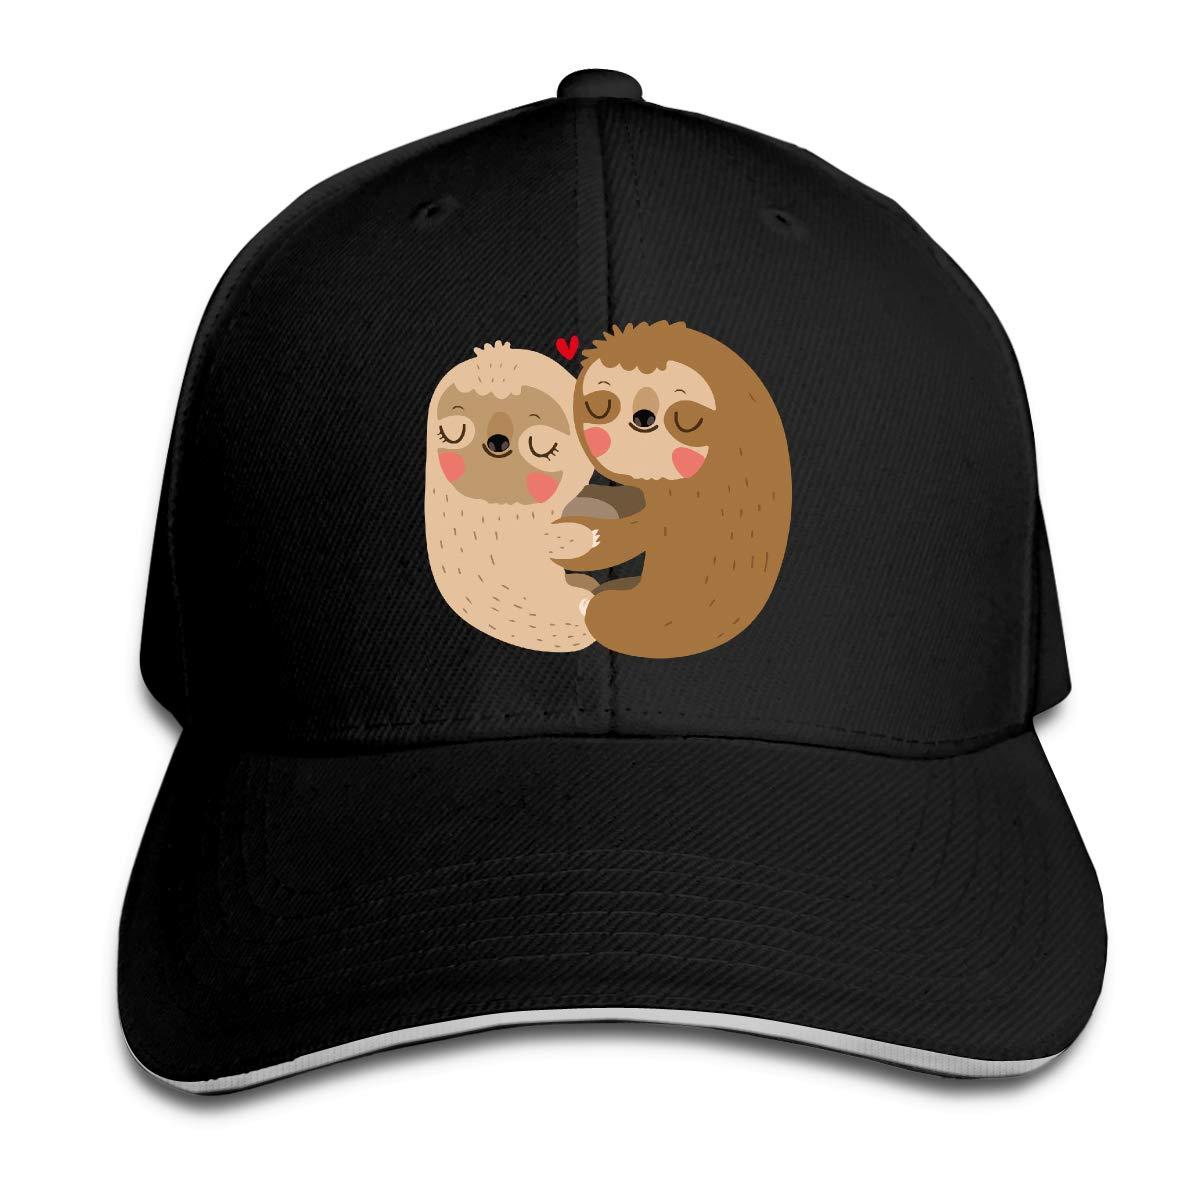 Mermaid Sloth Outdoor Snapback Sandwich Cap Adjustable Baseball Hat Street Rapper Hat